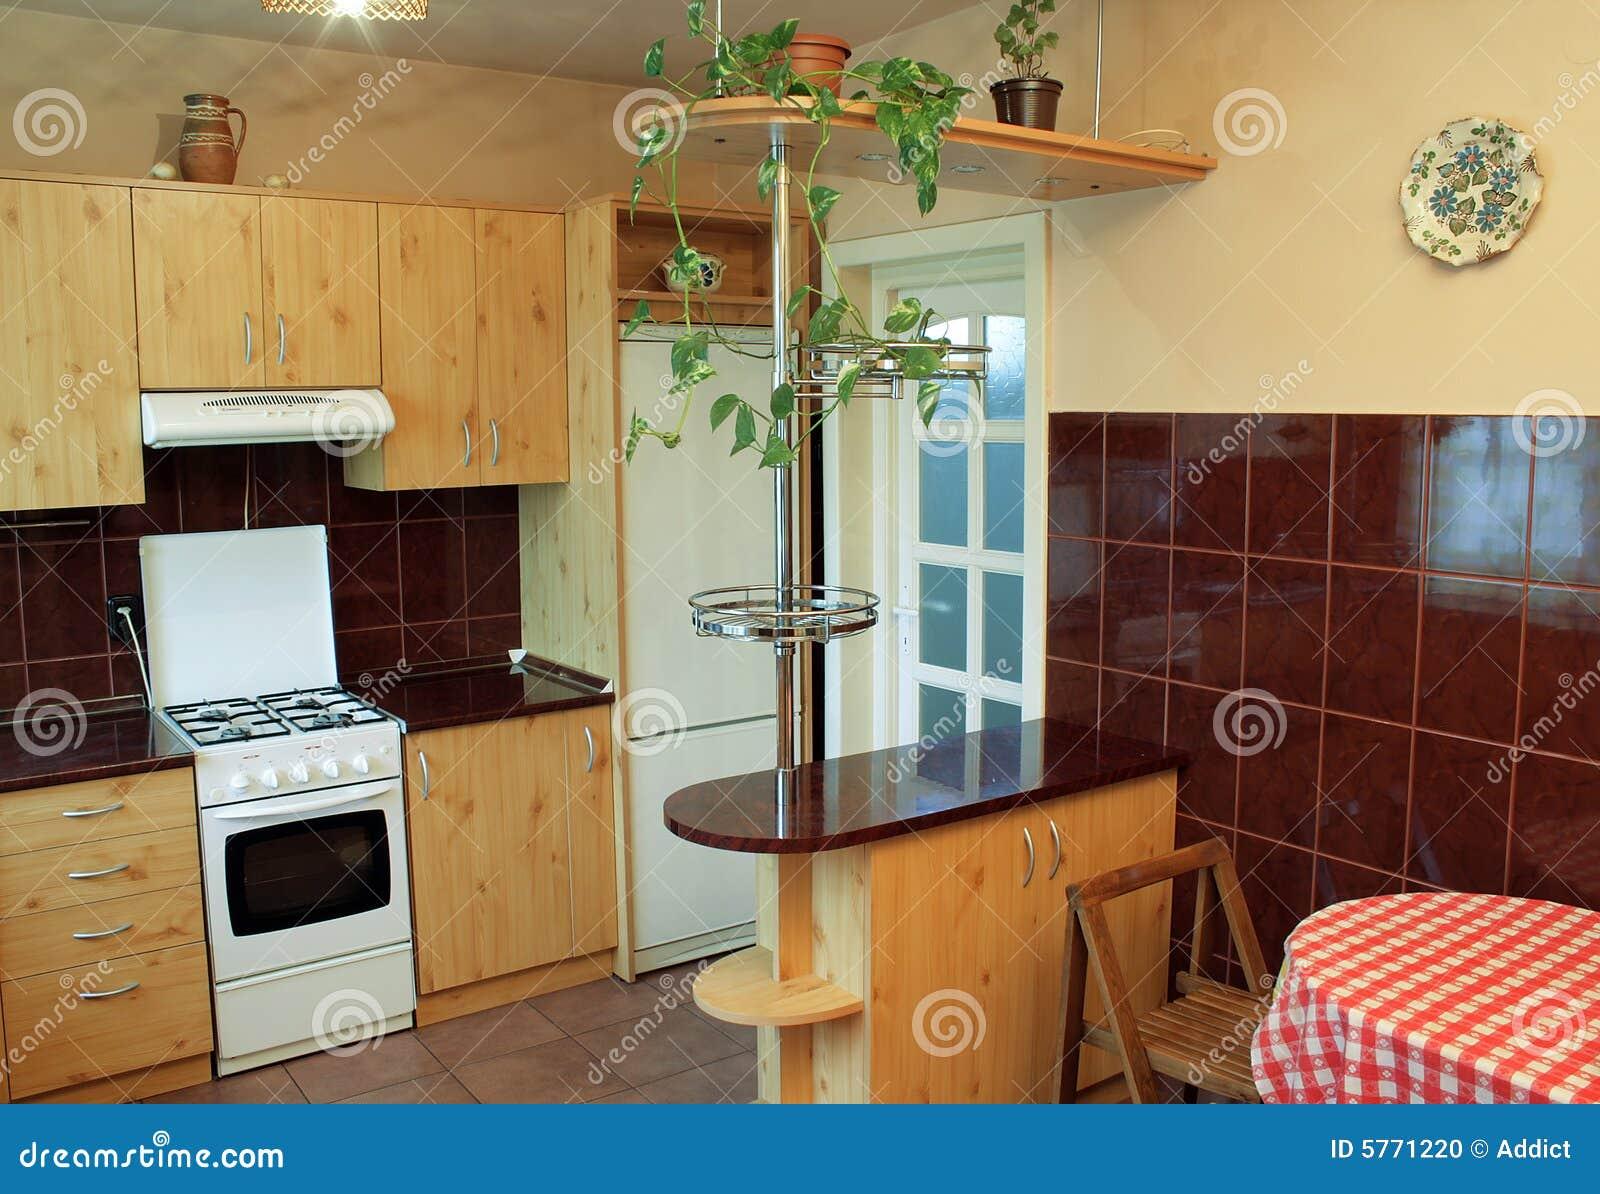 Cocina moderna con muebles de madera foto de archivo for Peinture meubles cuisine v